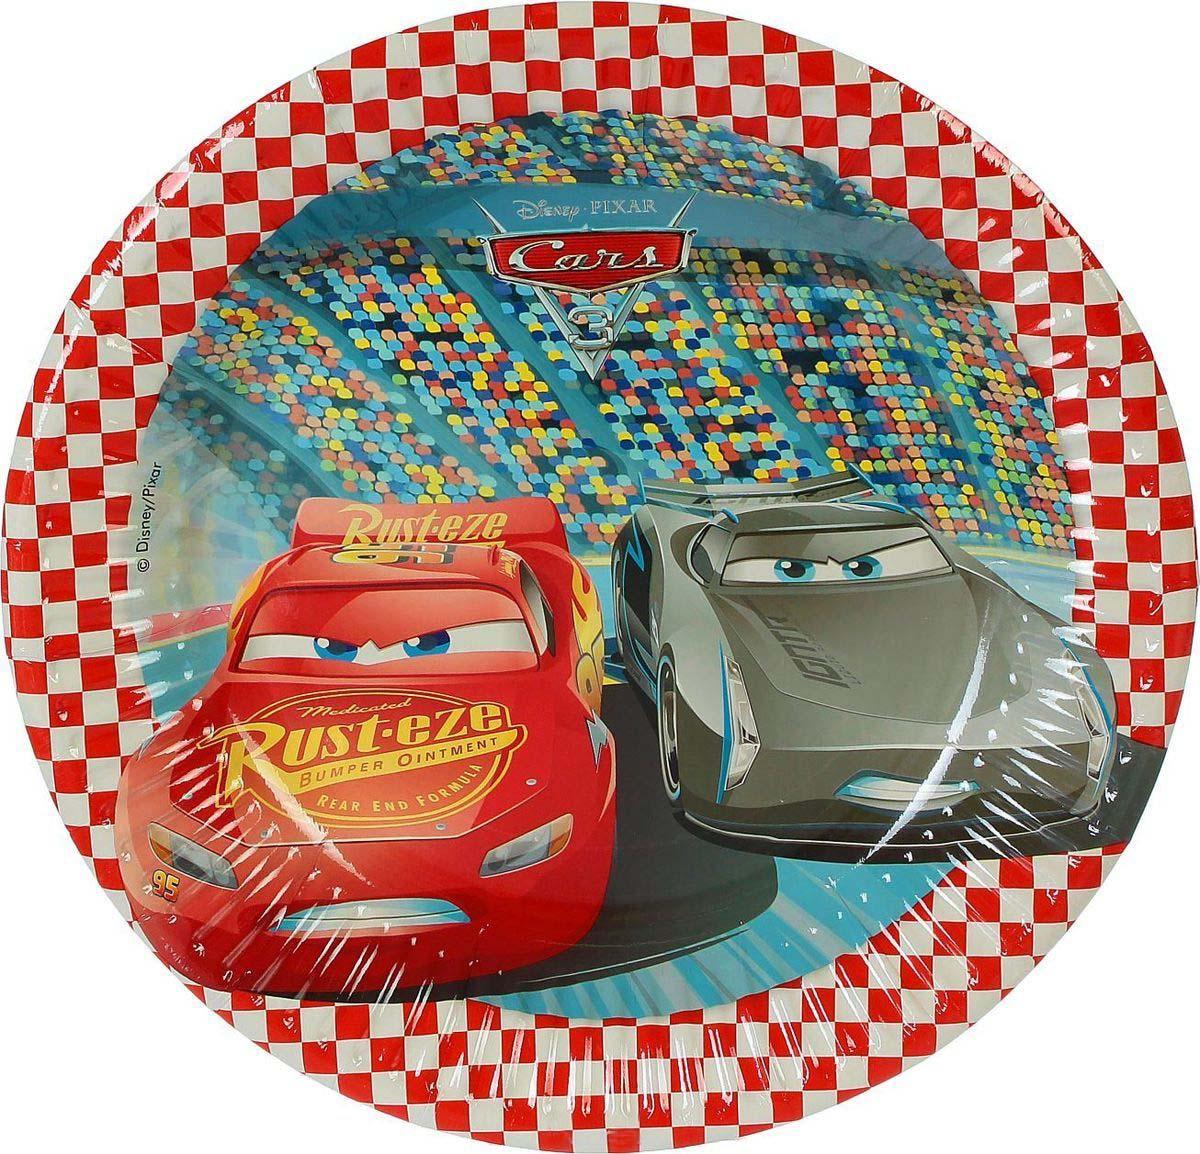 Набор тарелок – Тачки 3, 8 штукТачки<br>Набор тарелок – Тачки 3, 8 штук<br>